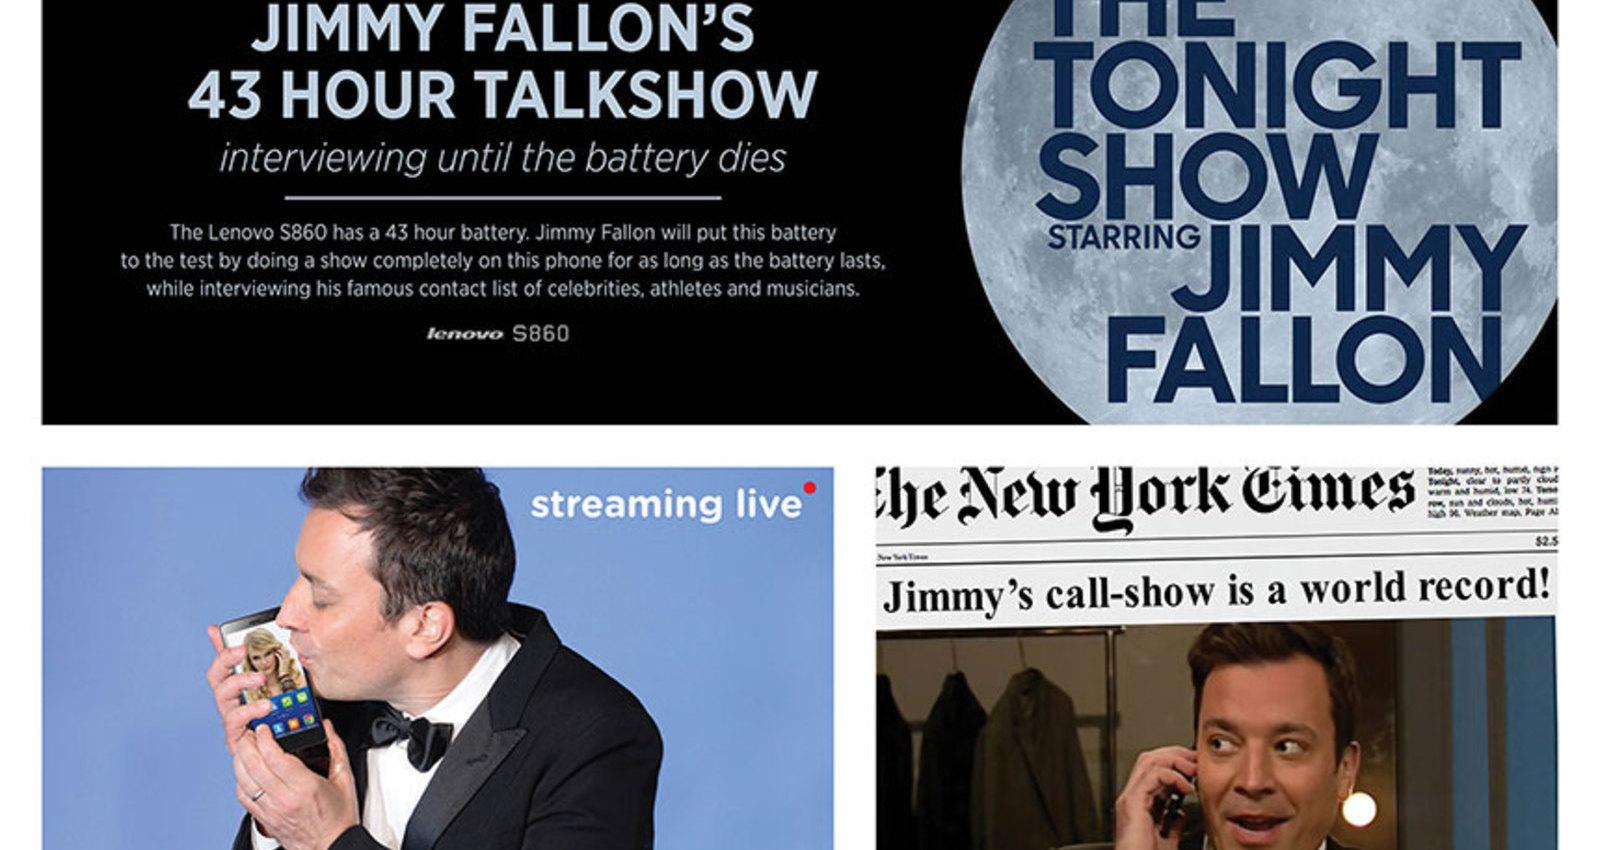 43 Hour Talk Show